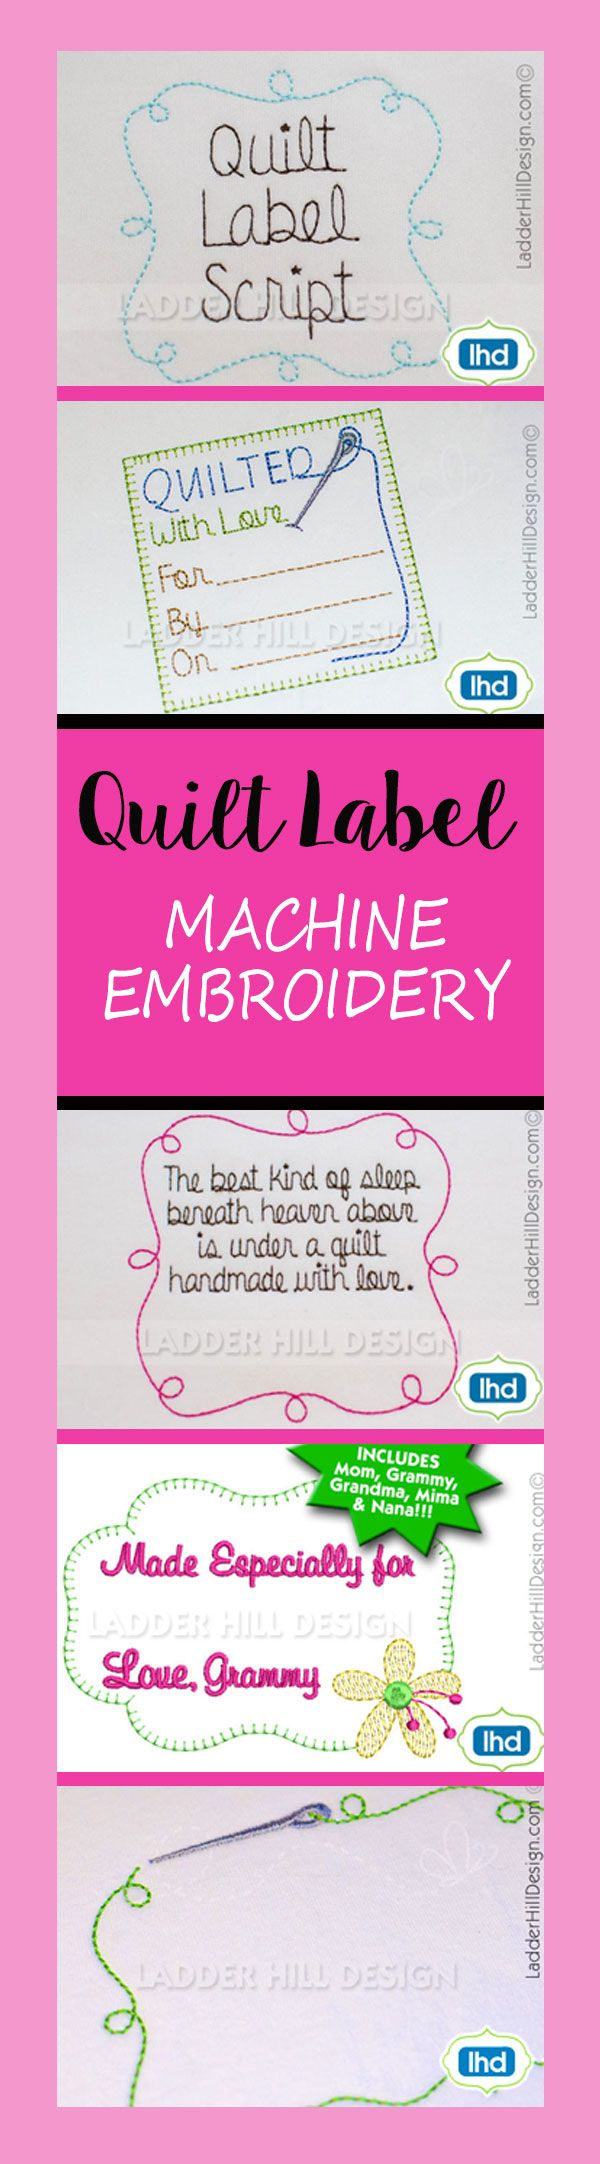 Quilt Label Machine Embroidery, Quilt Label Script, Custom Quilt Label, Quilting Machine Embroidery